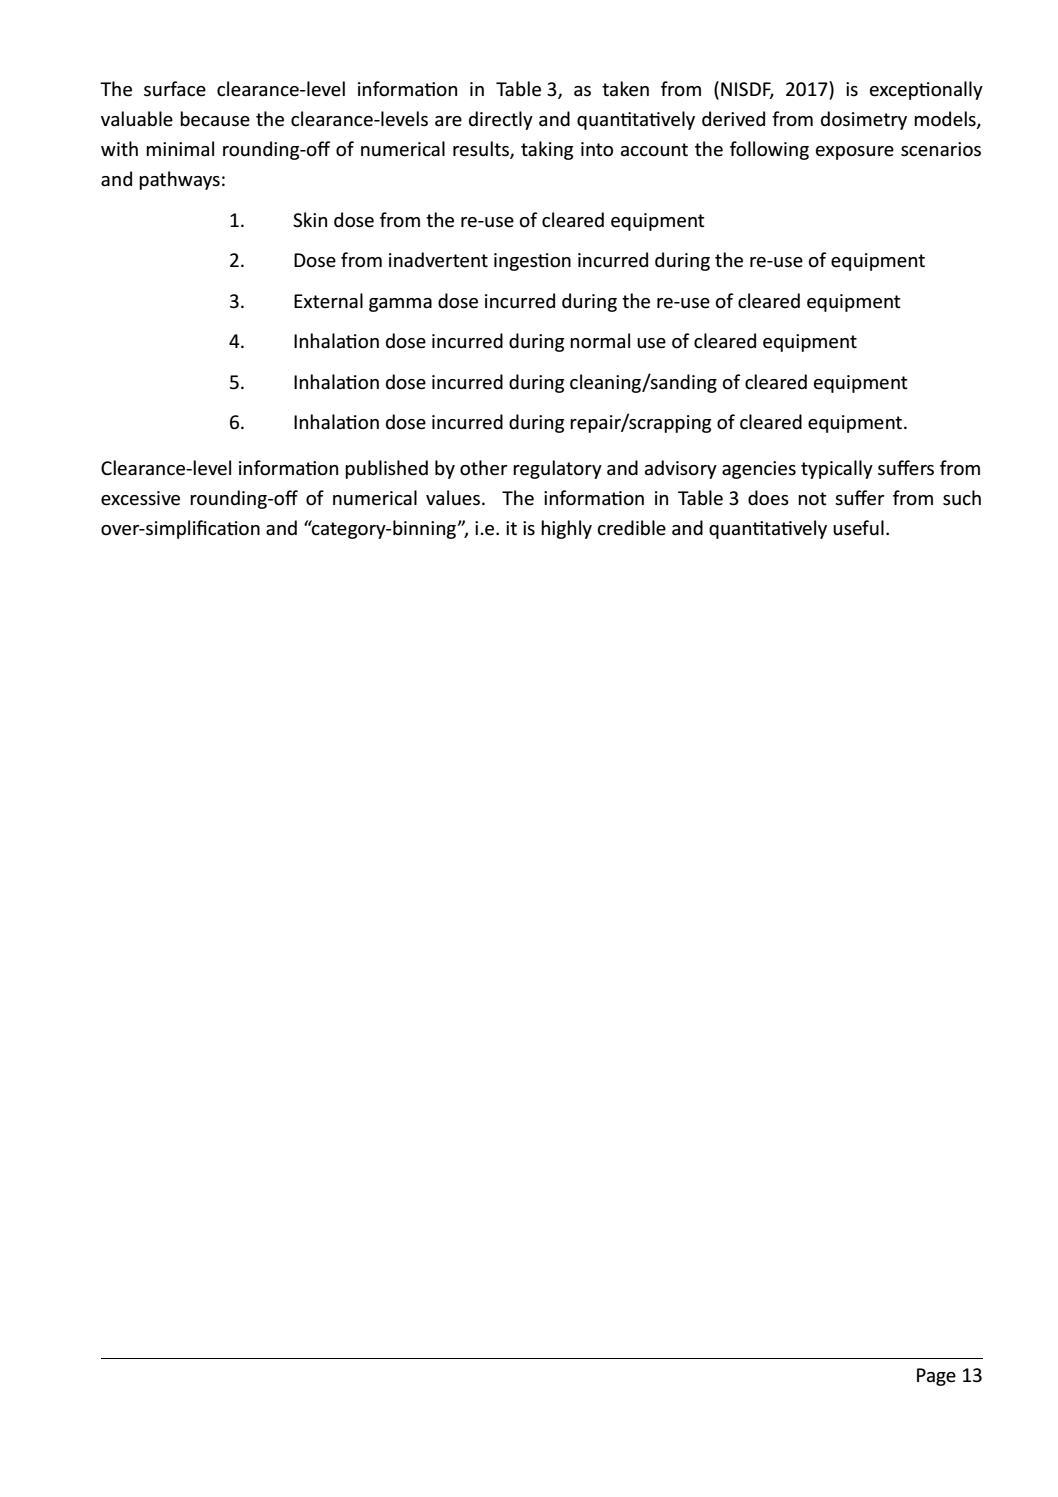 RADIOACTIVE WASTE: COMPUTATIONAL CHARACTERISATION and SHIELDING page 38